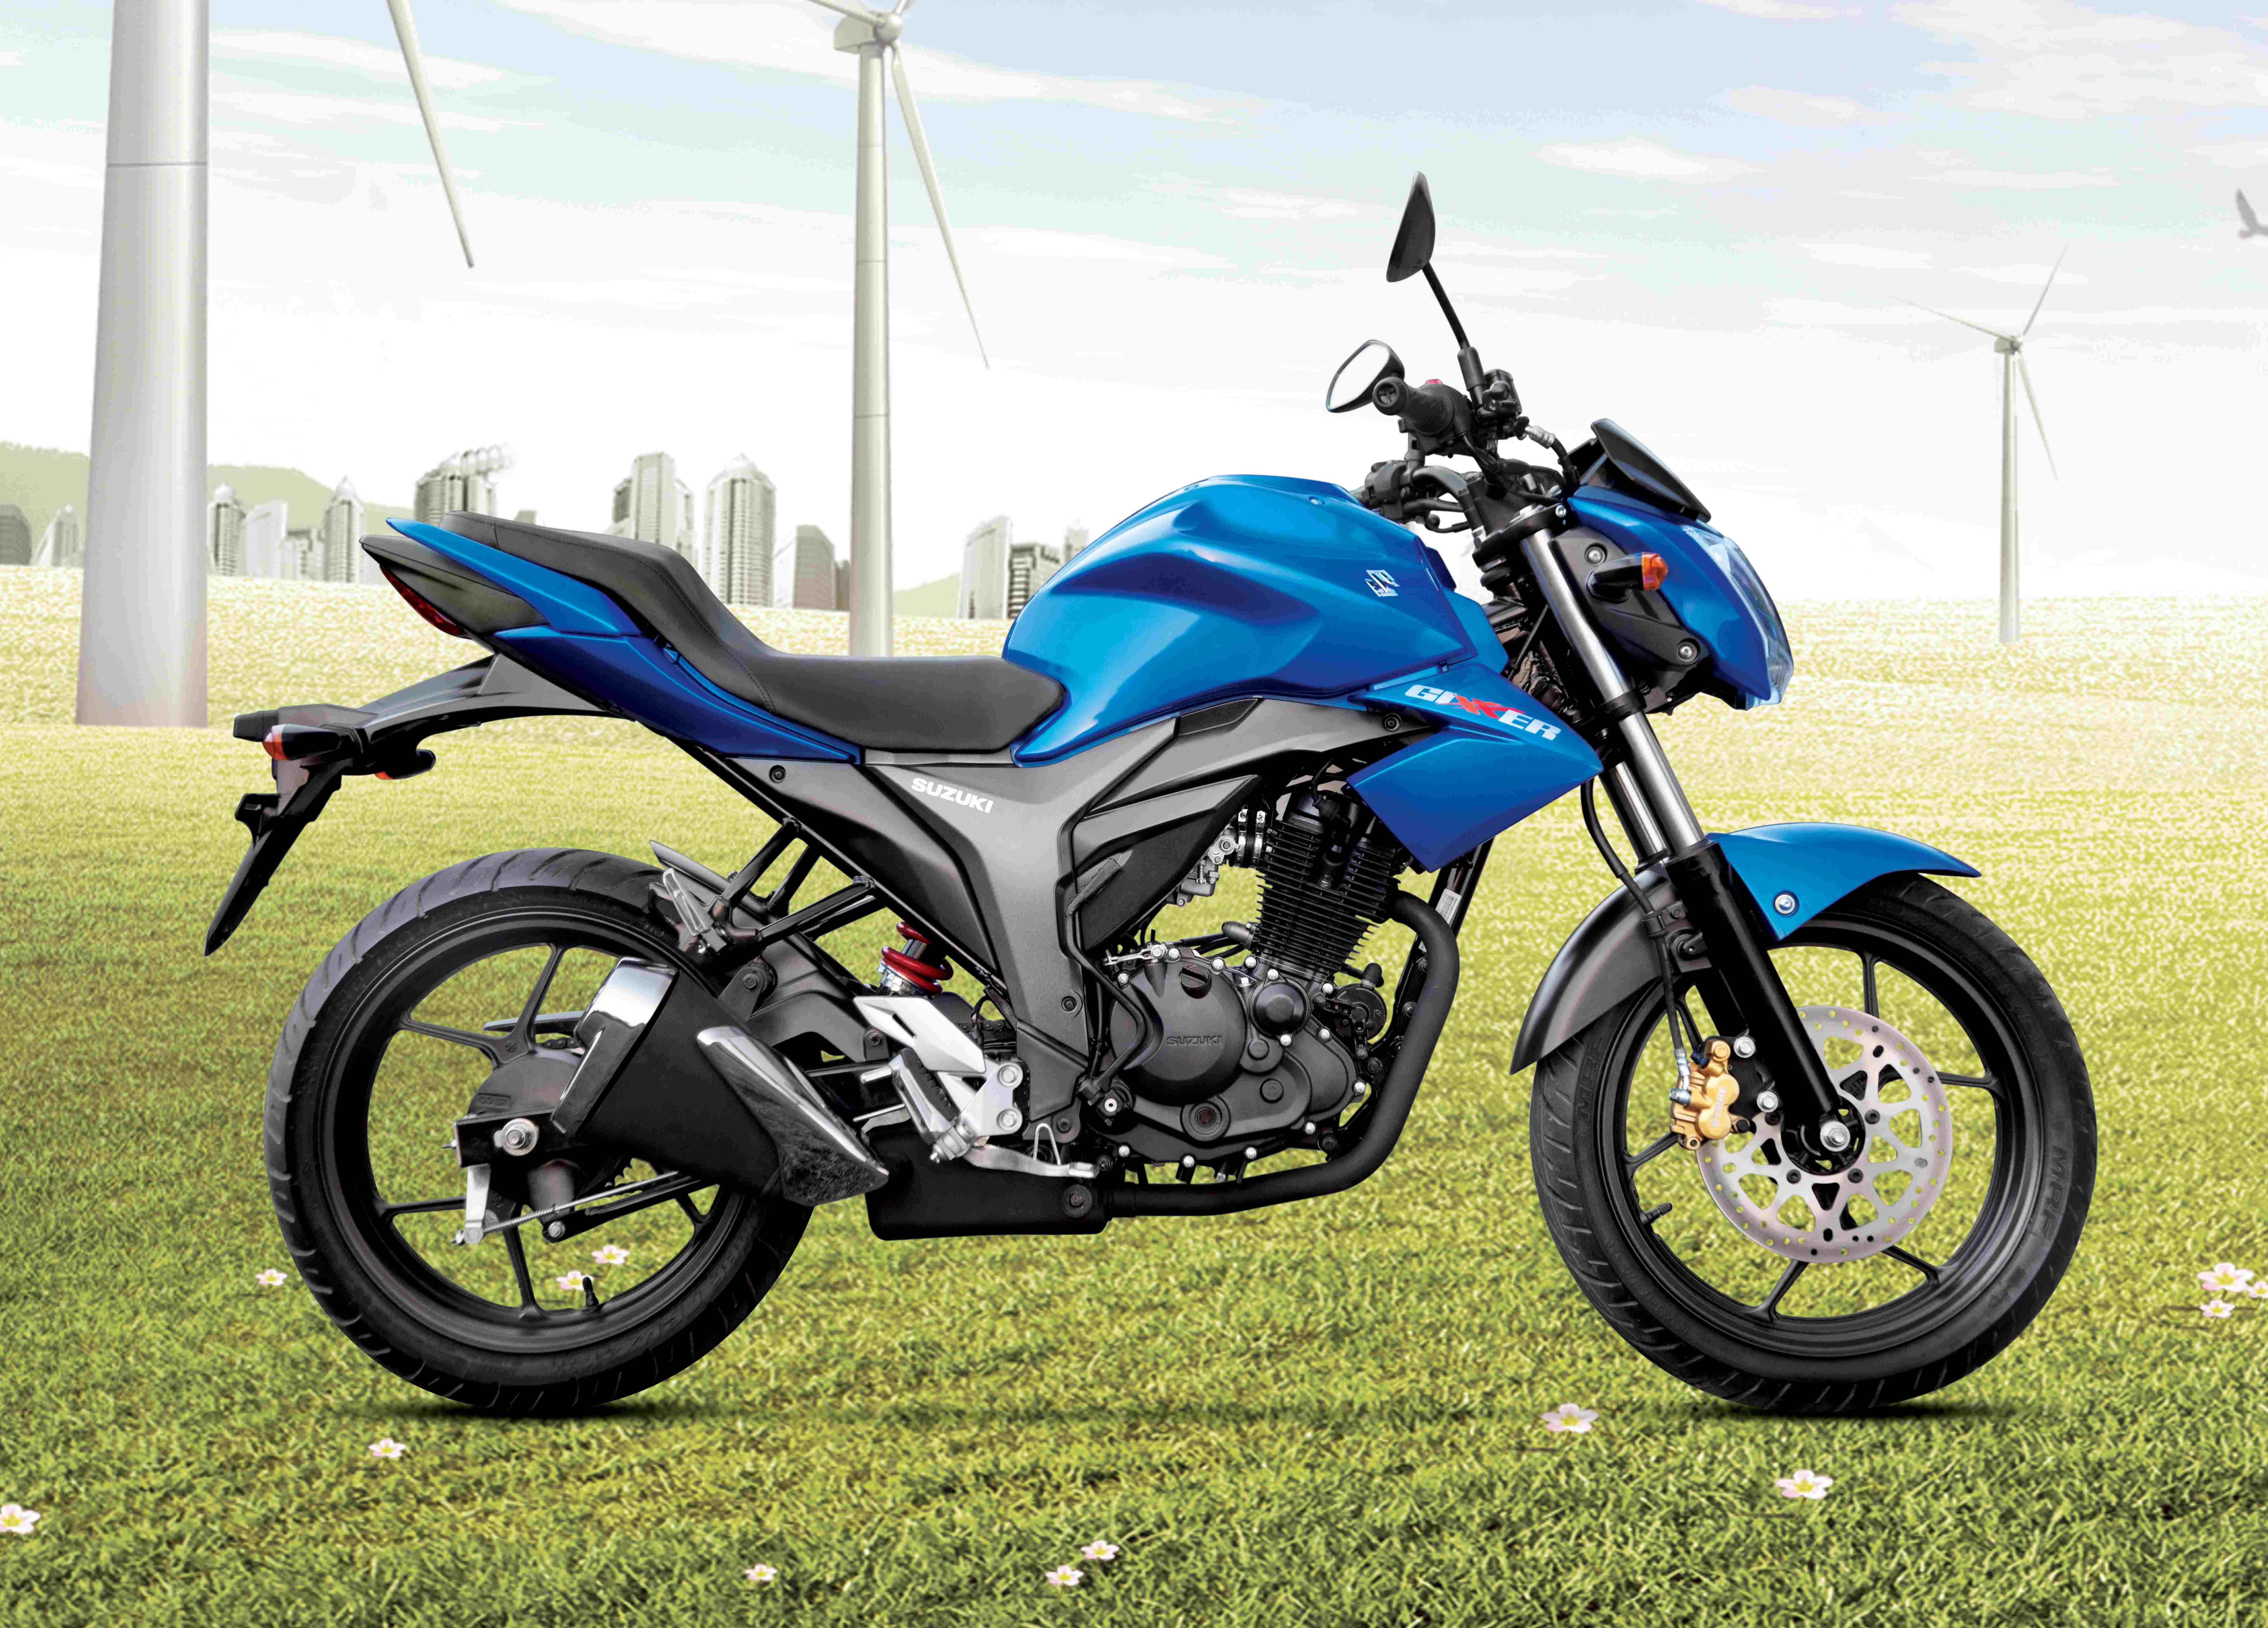 suzuki two-wheelers unveils two new offerings: the 'gixxer